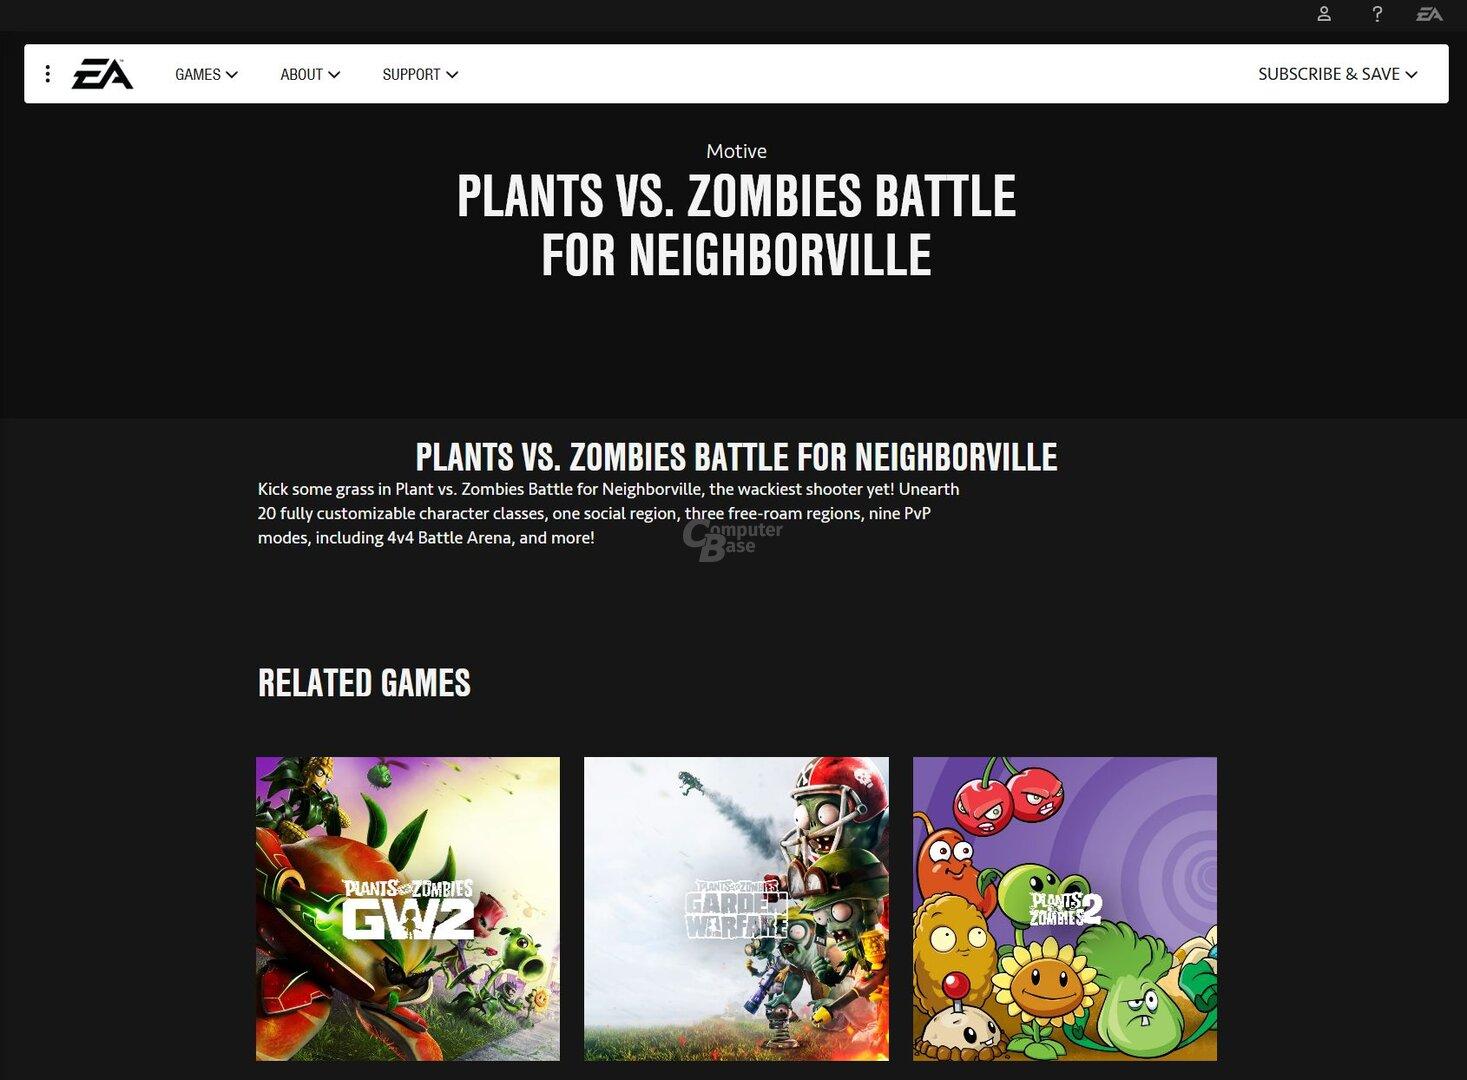 EA-Website enthüllte Plants vs Zombies Battle for Neighborville (Screenshot von Leser EMkaEL)